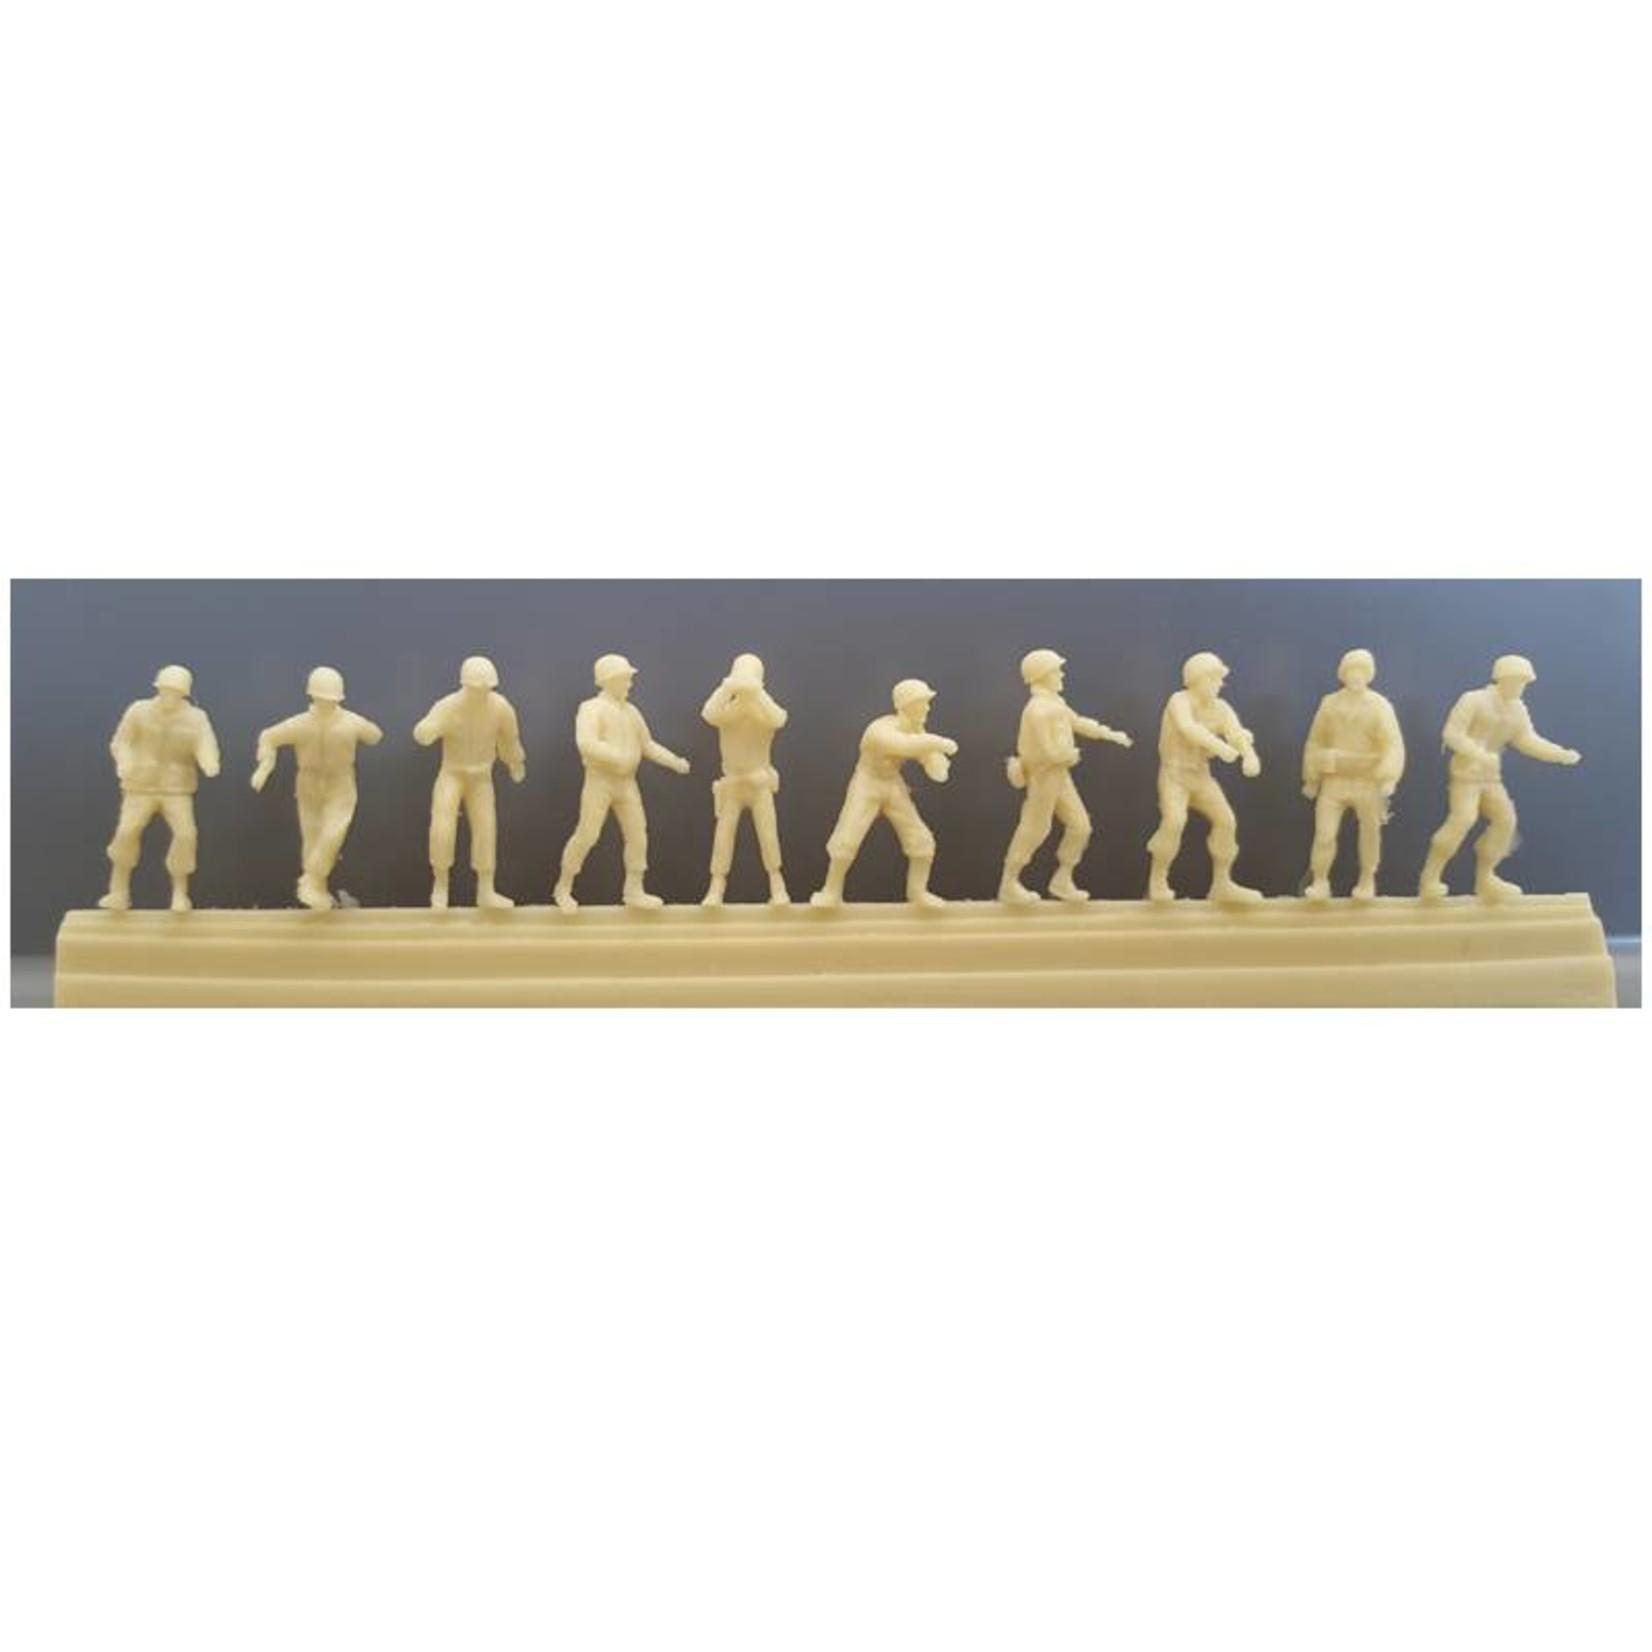 US Artillery crew